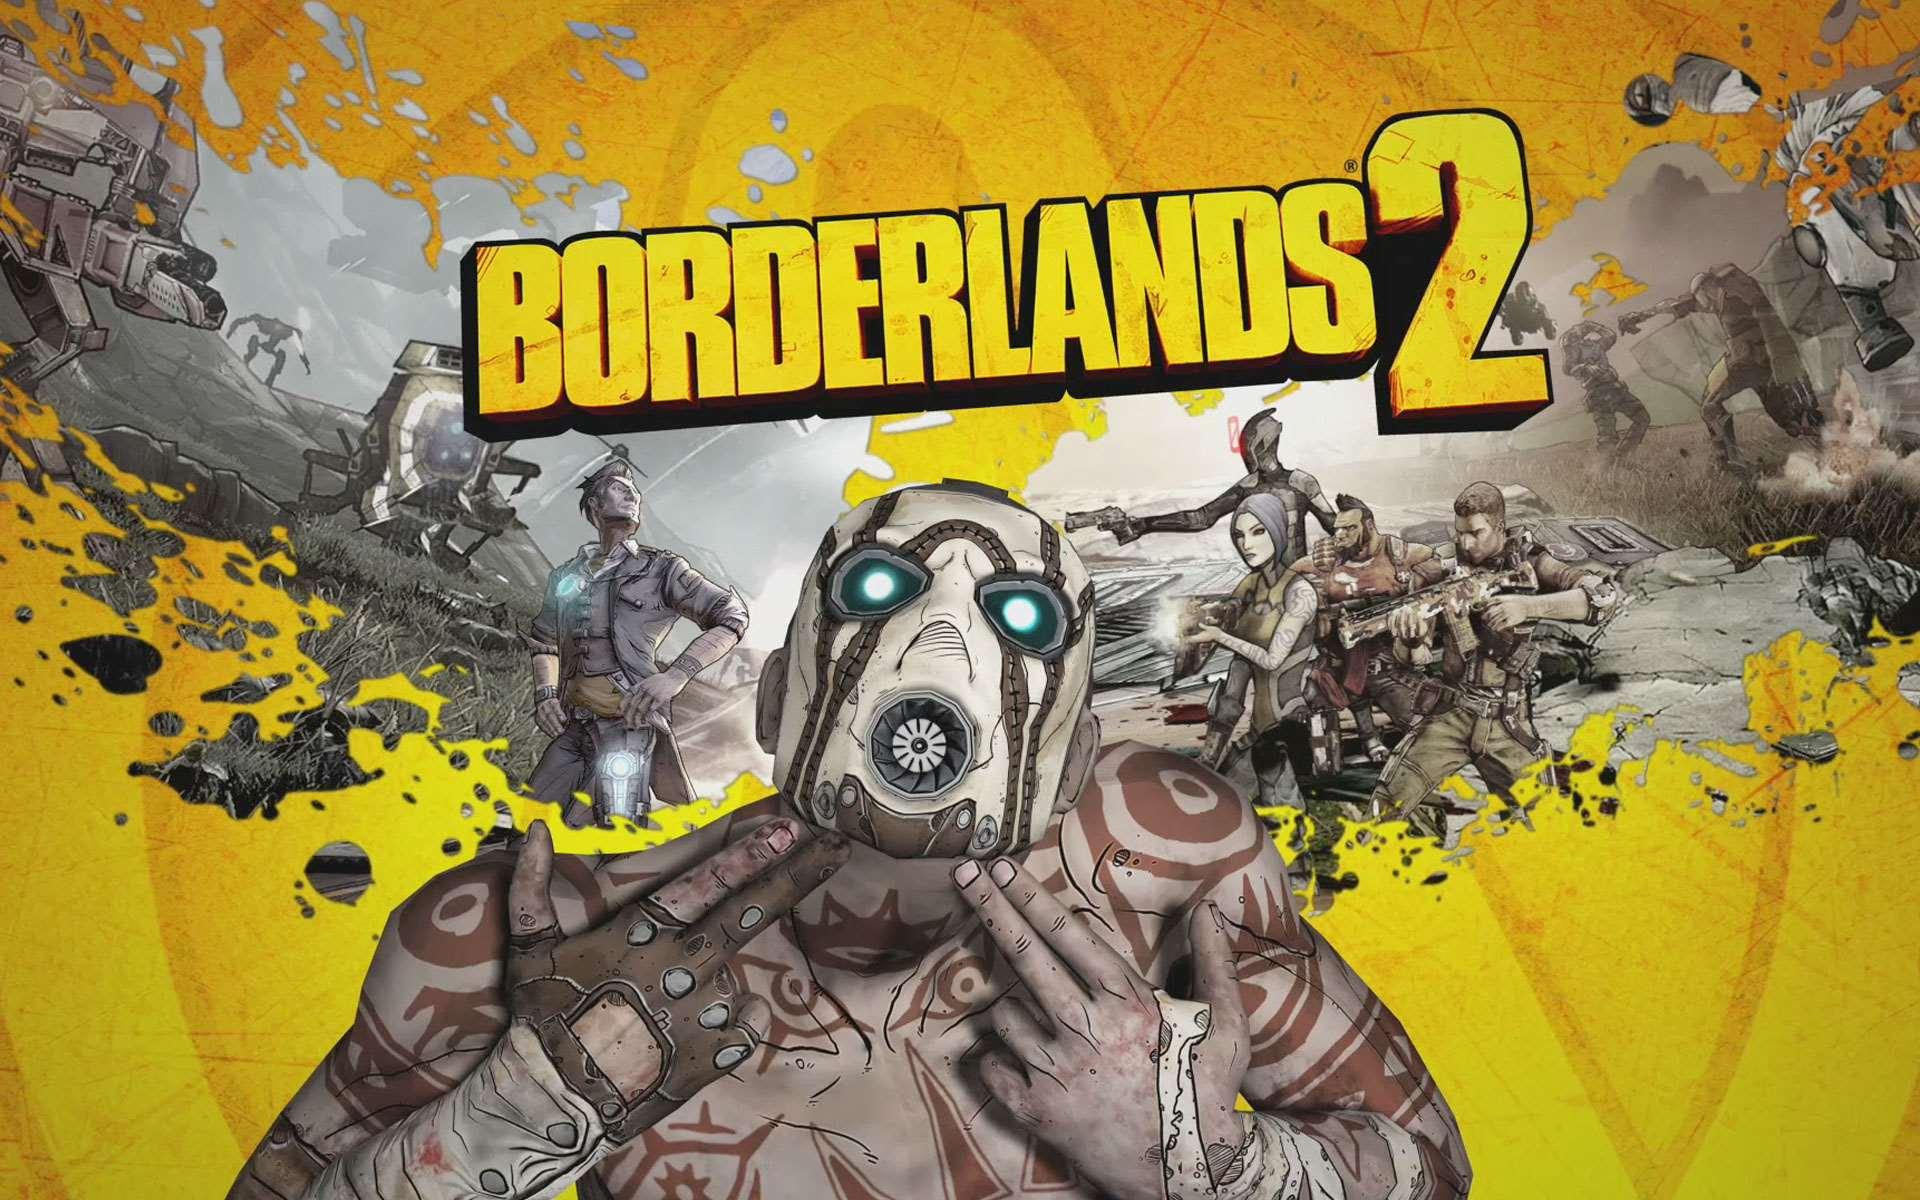 Borderlands 2 Borderlands 2 Wallpaper 1 Wallpaper